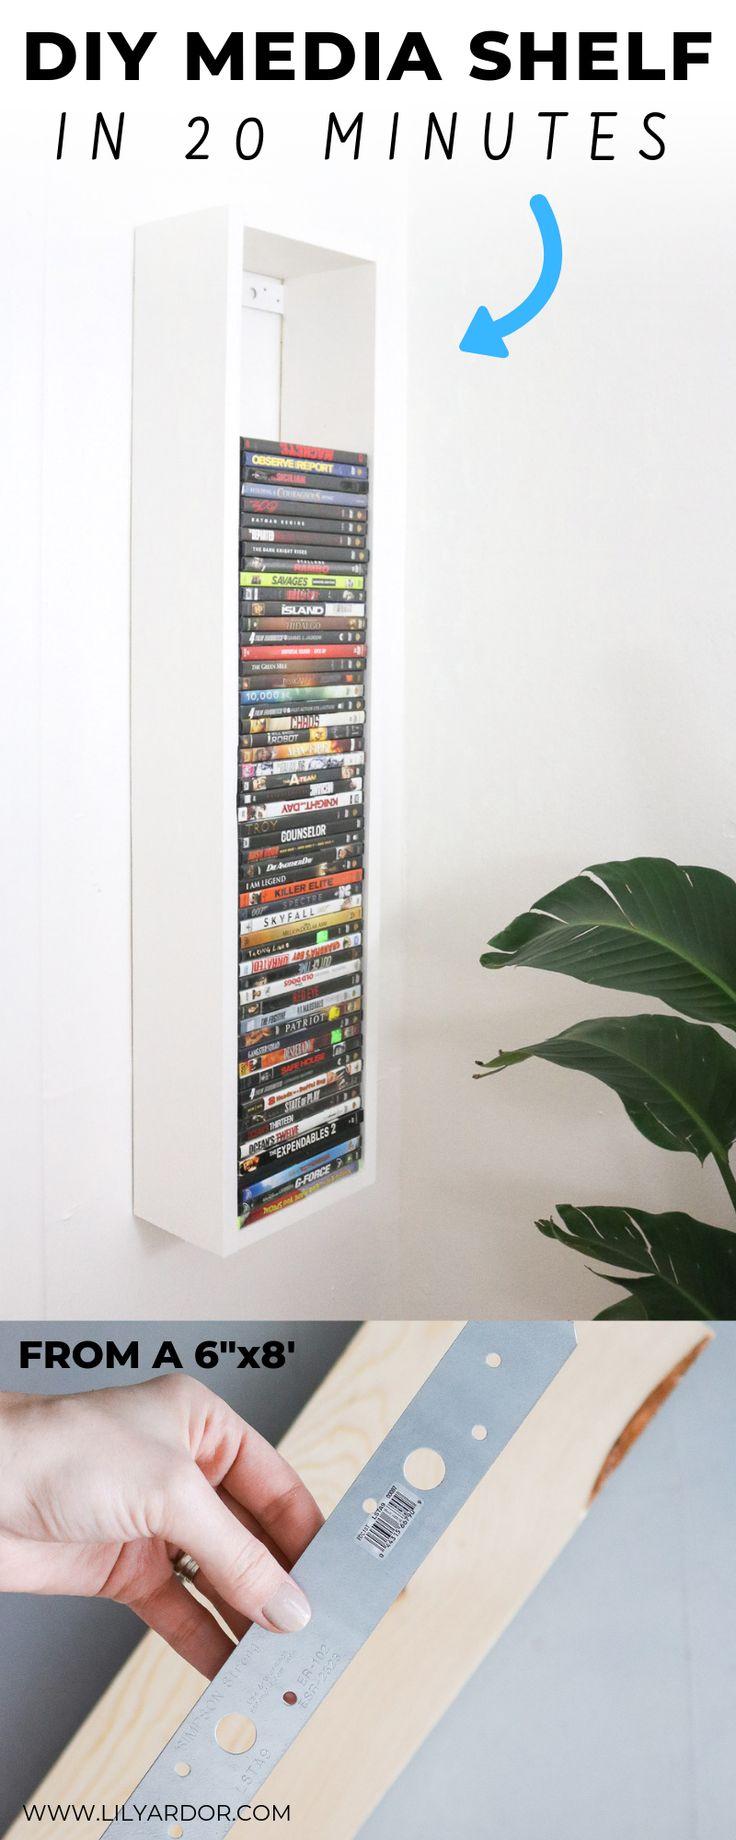 DIY Media Shelf